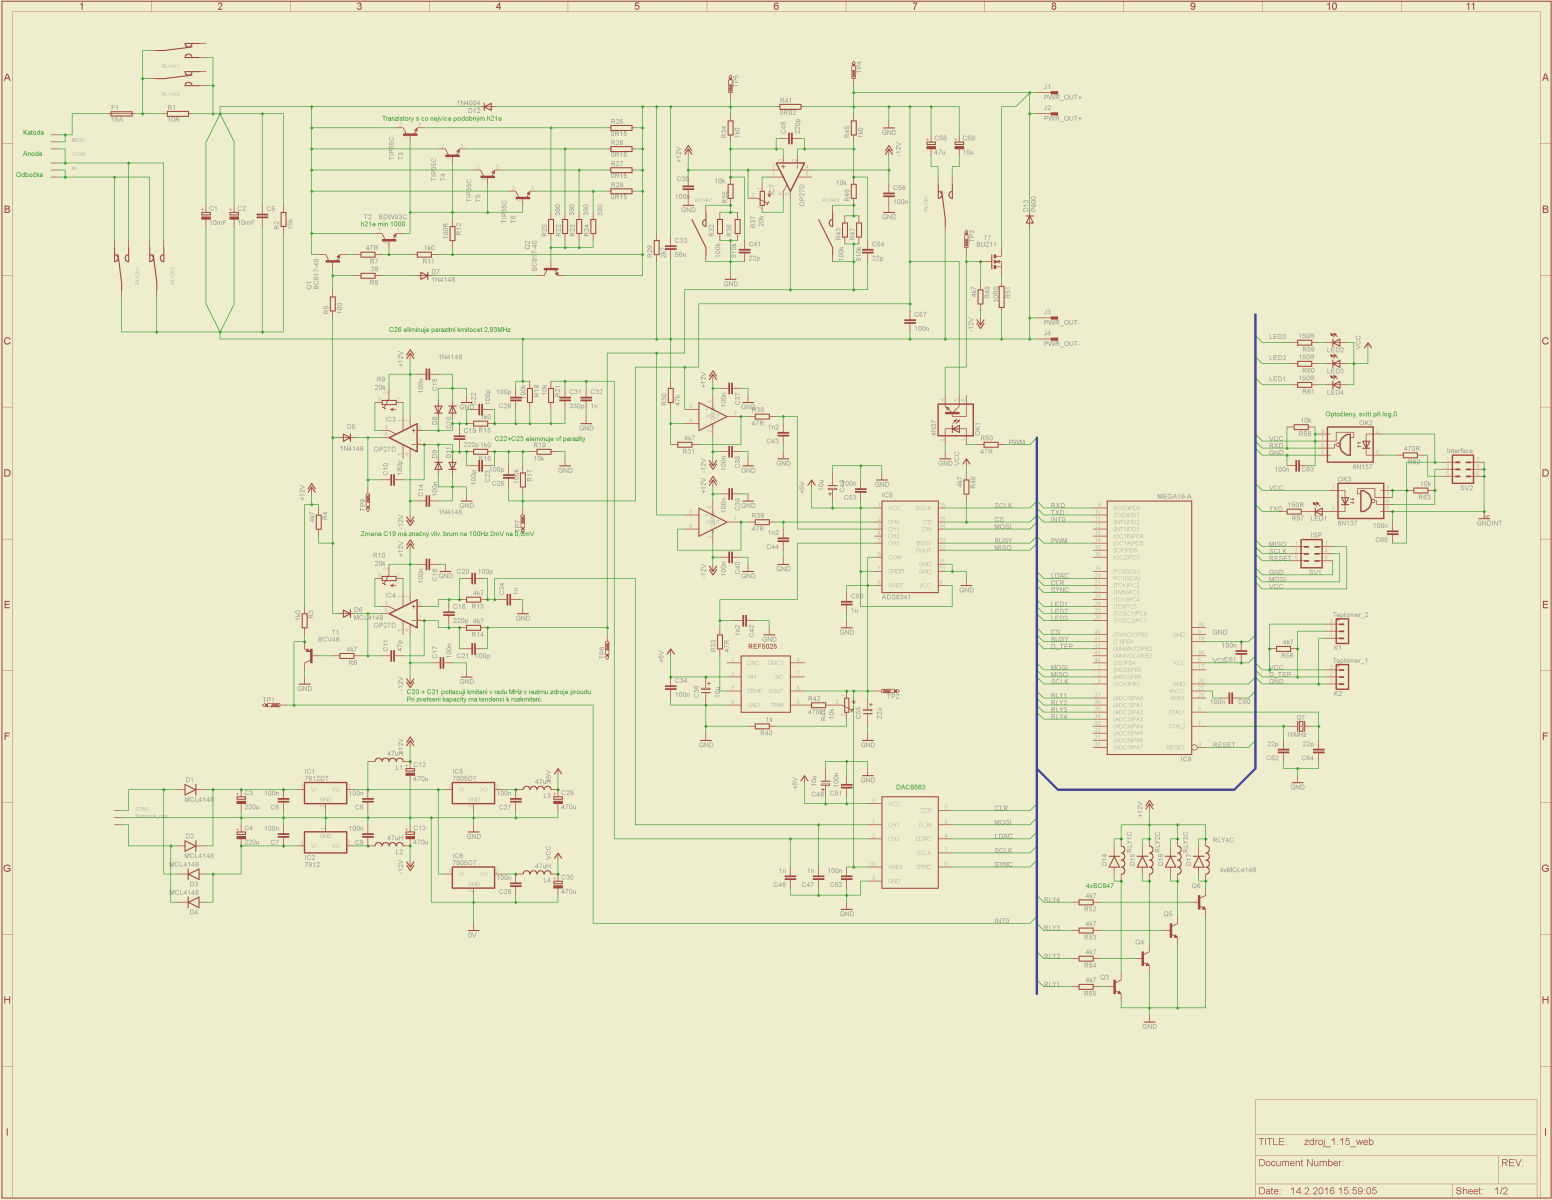 Slave_schematic_web1